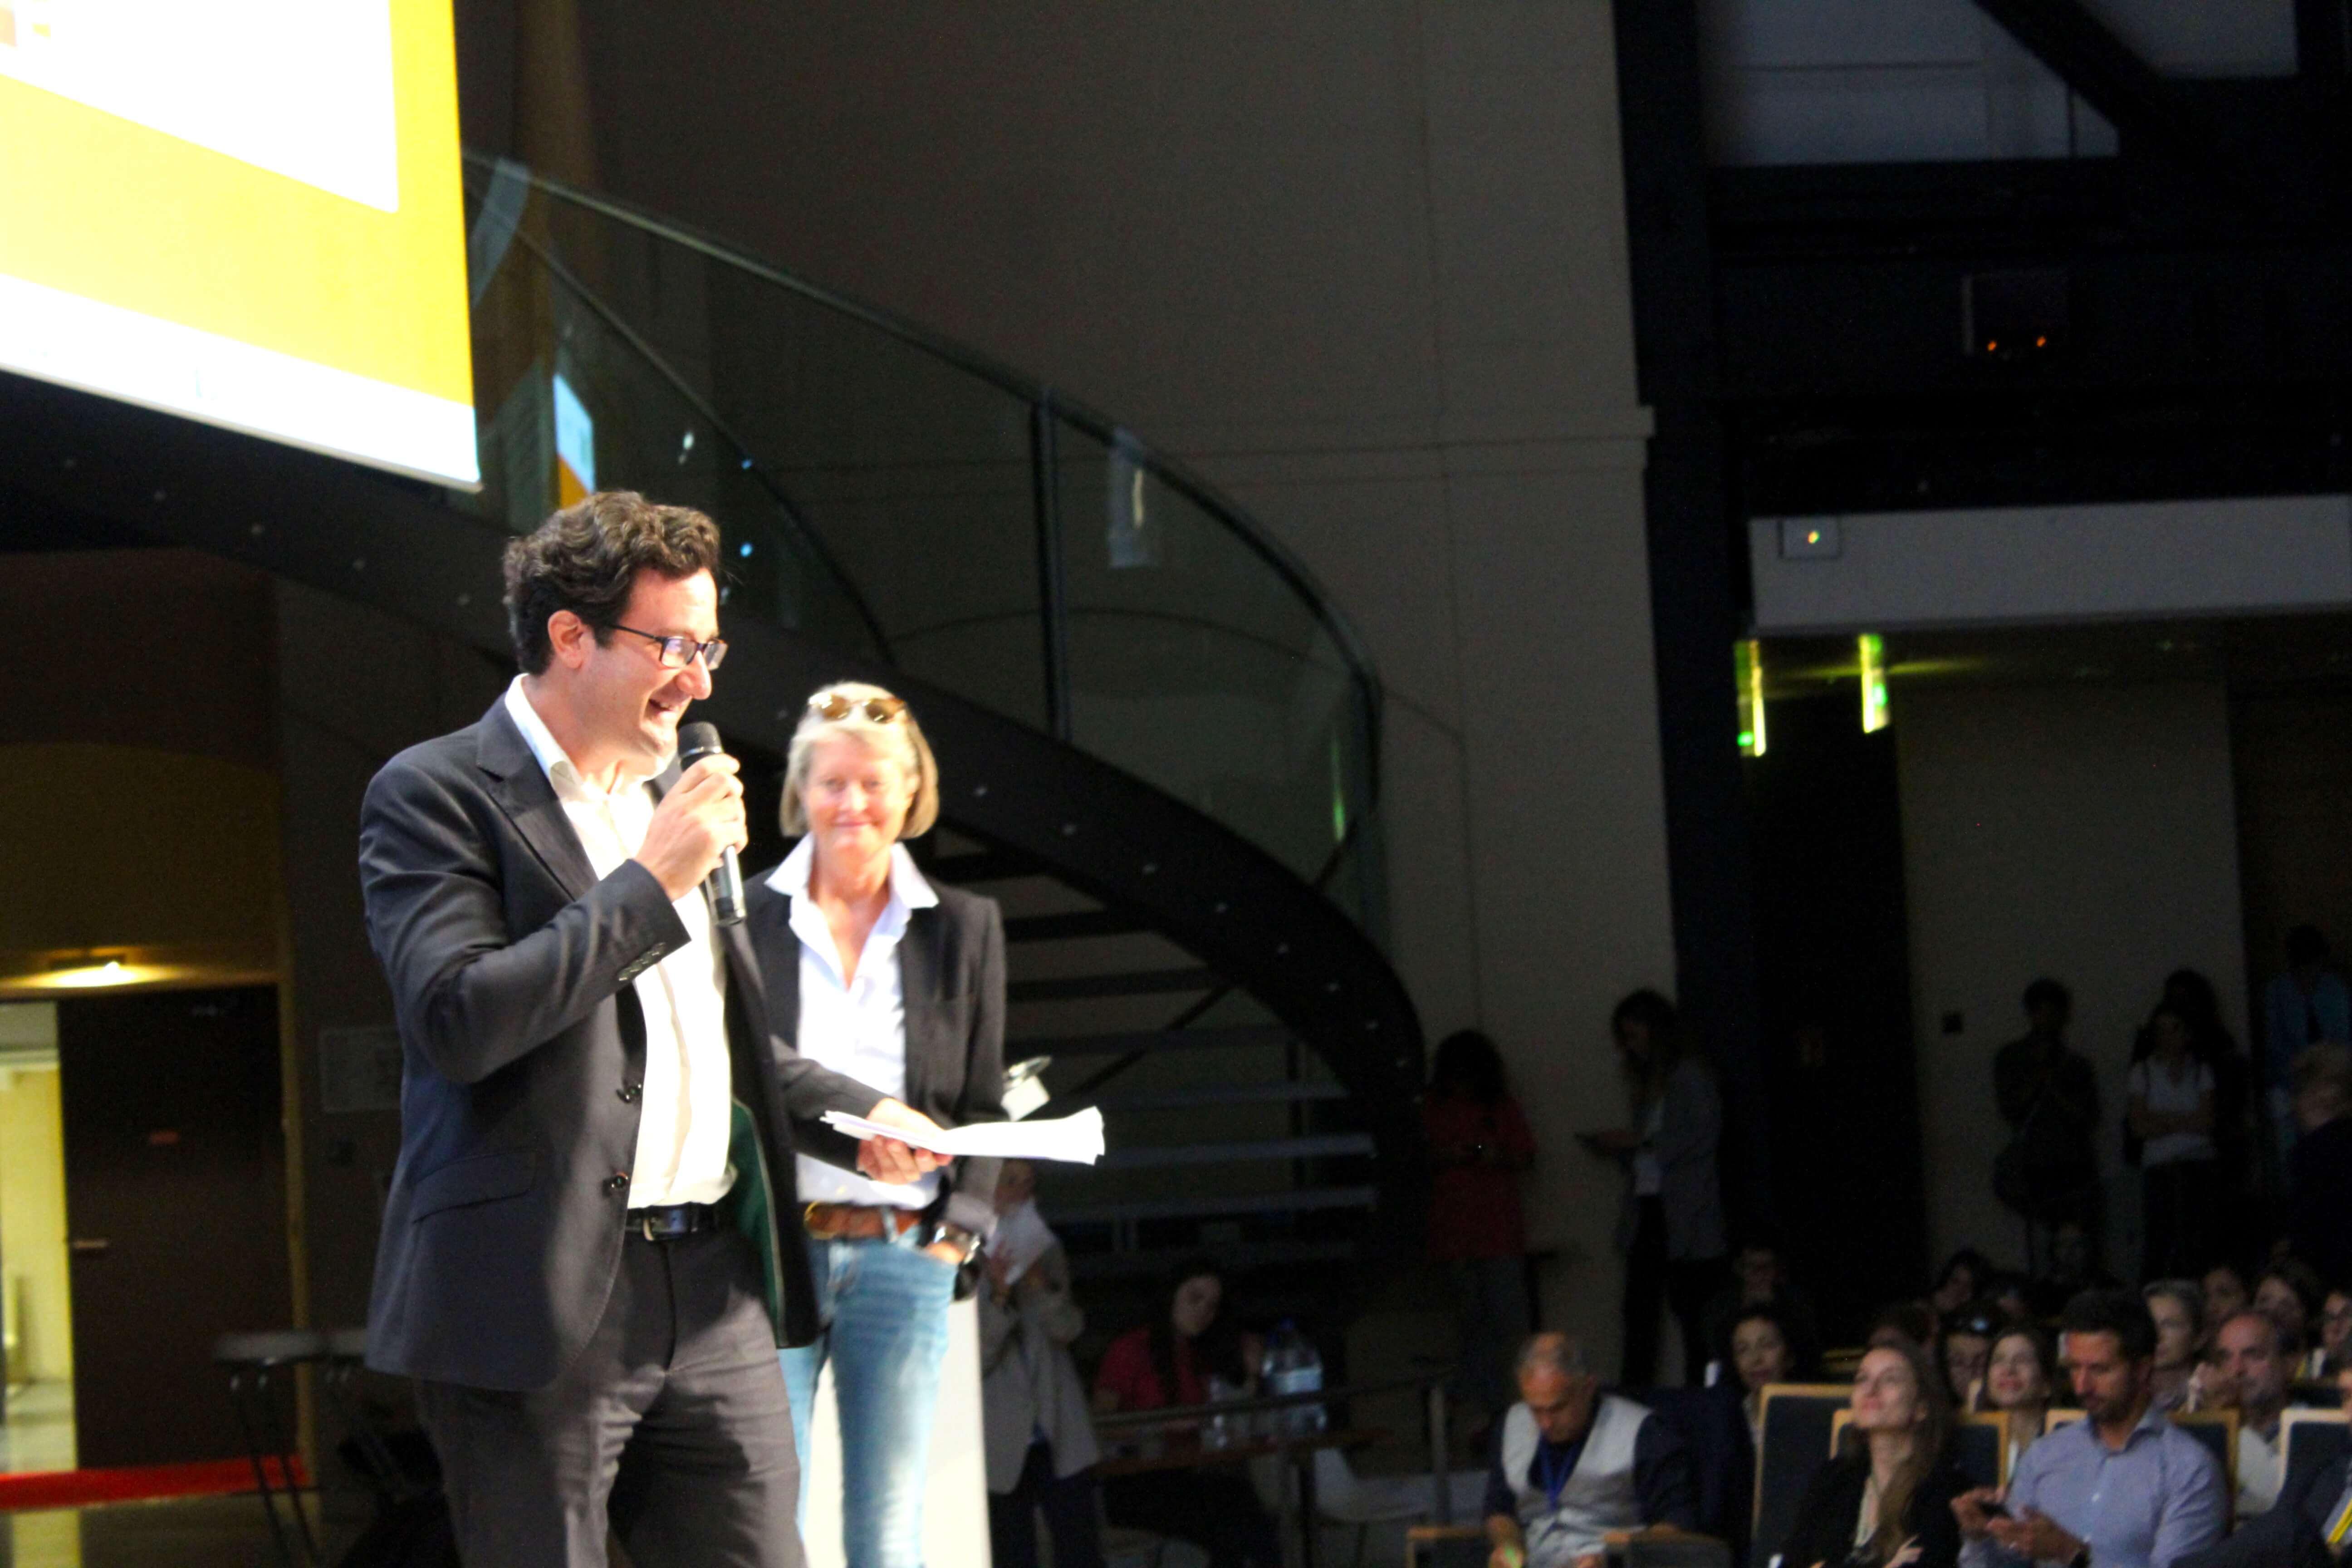 Christian de Boisredon accompagné d'Elena Comelli.